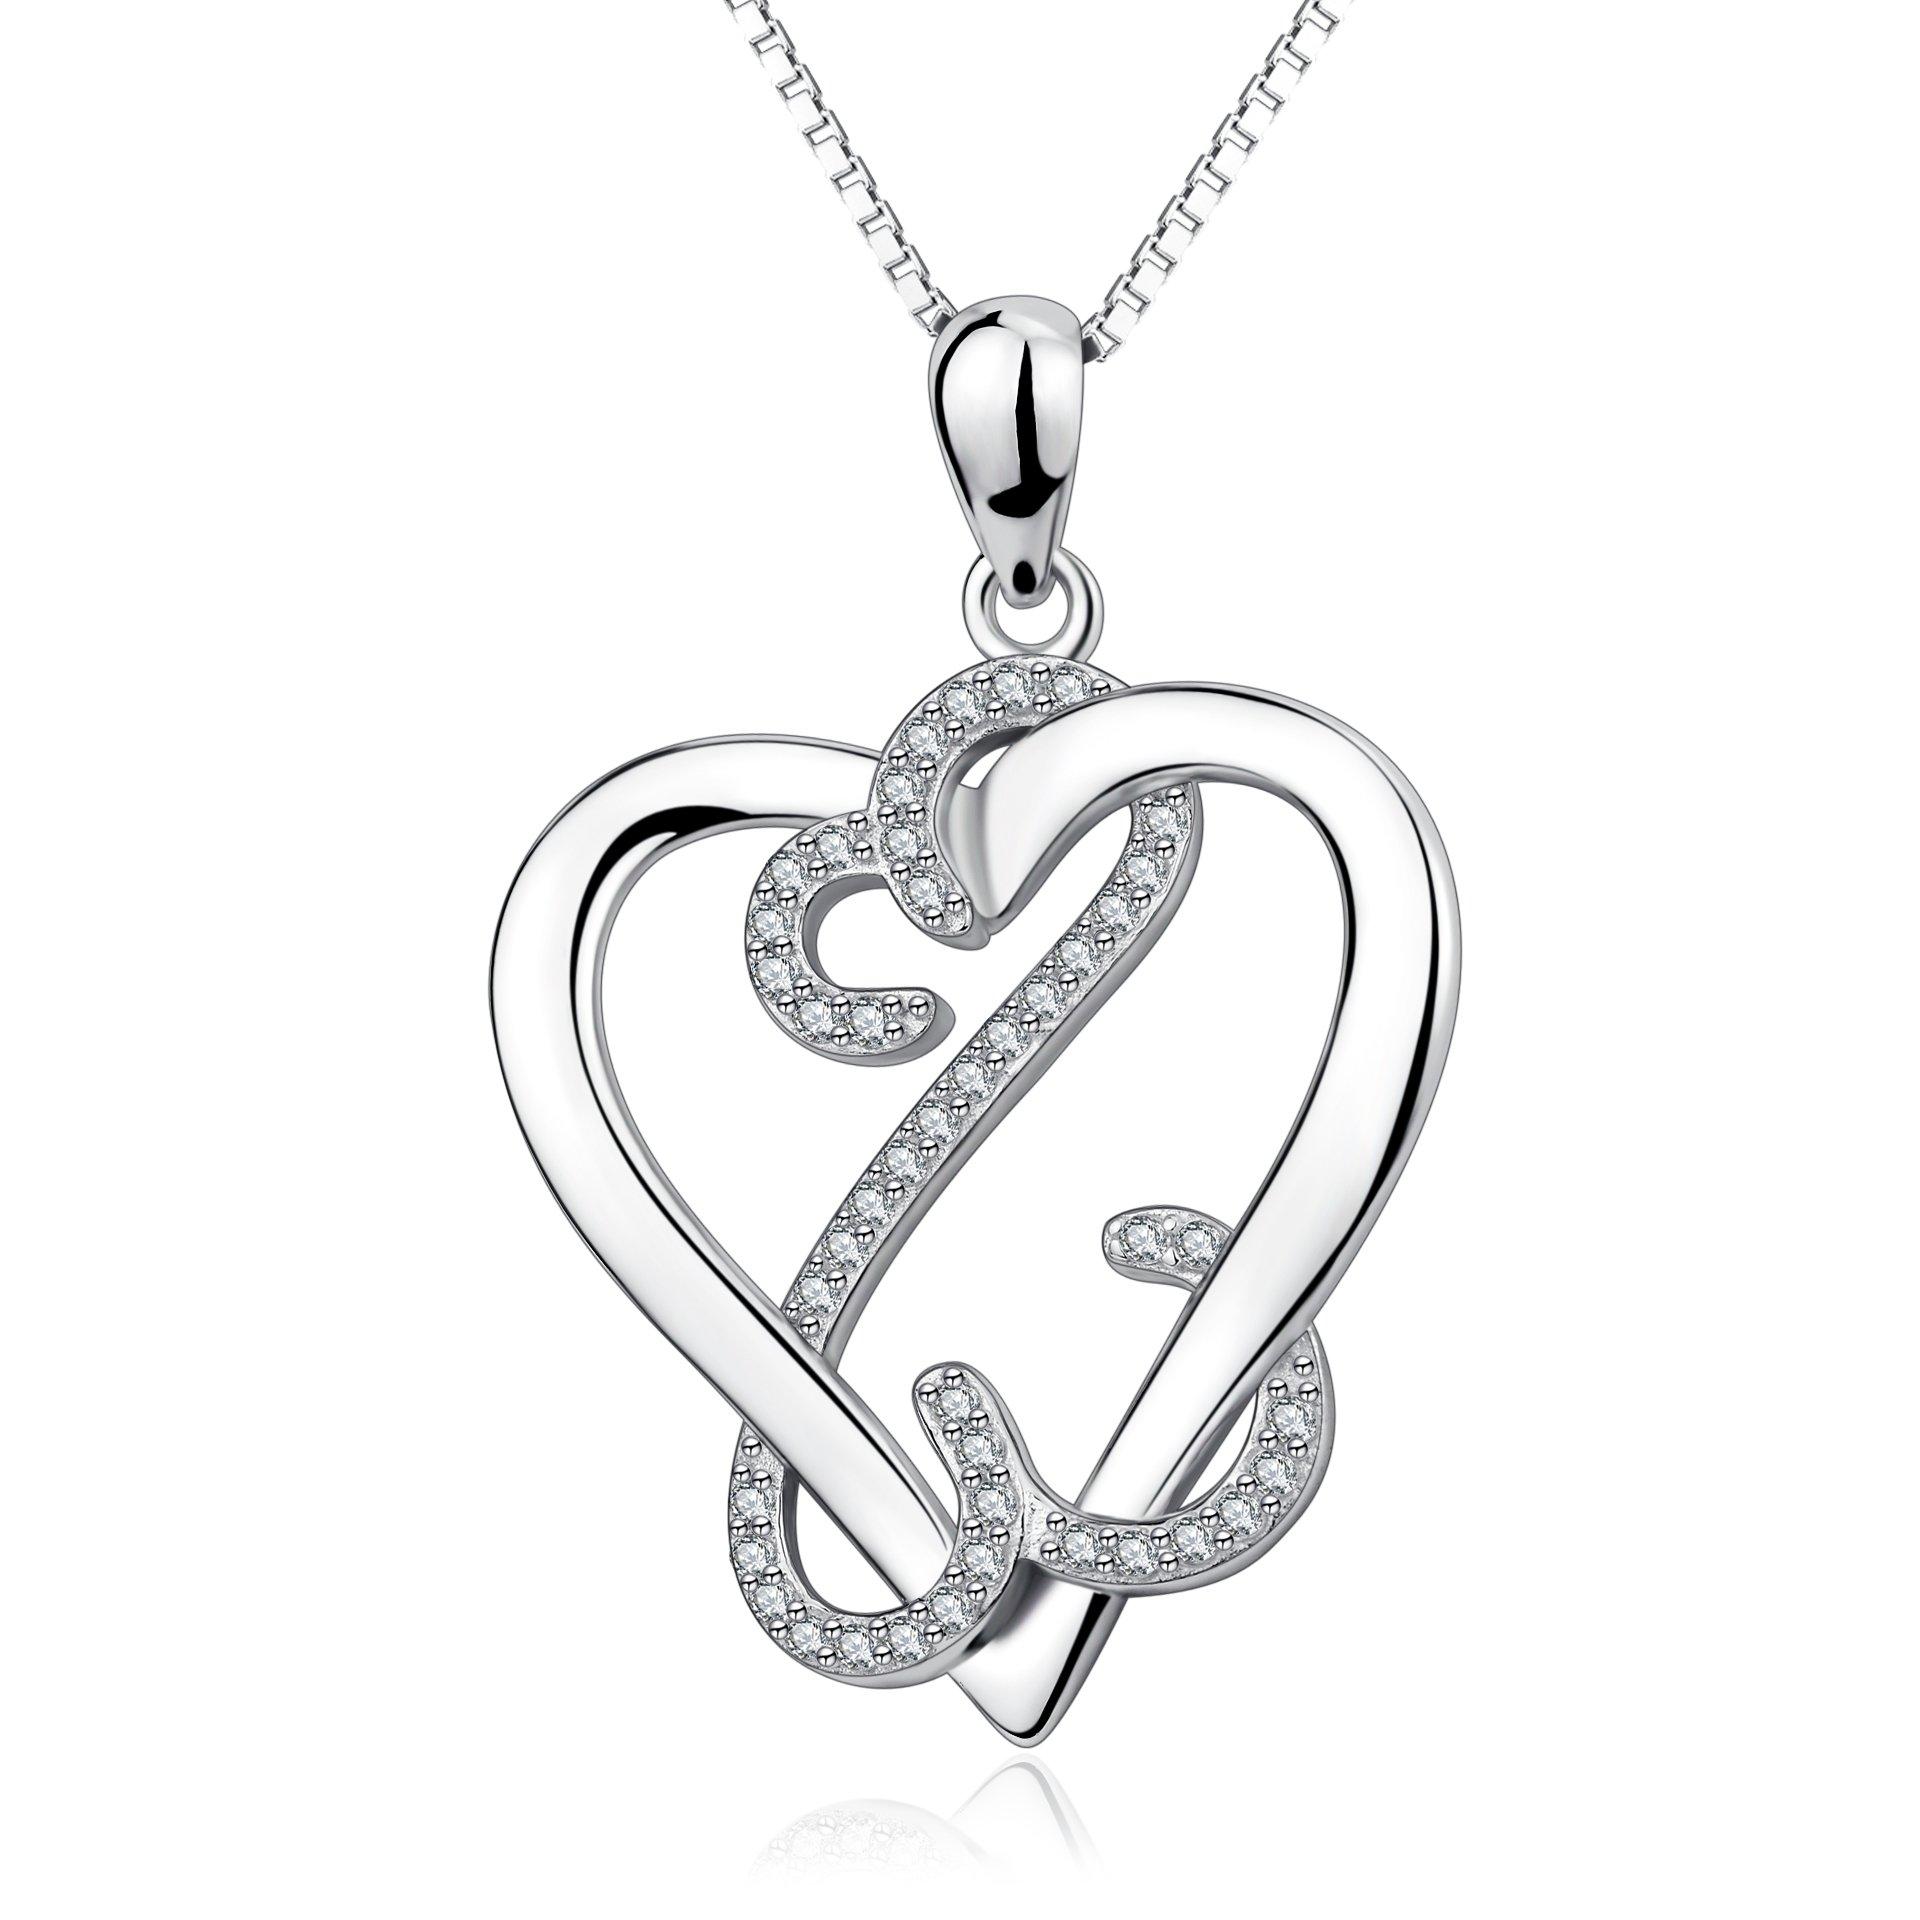 YFN 925 Sterling Silver Infinite Eternal Love Heart Pendant Necklace Charms 18'' for Women,Girls